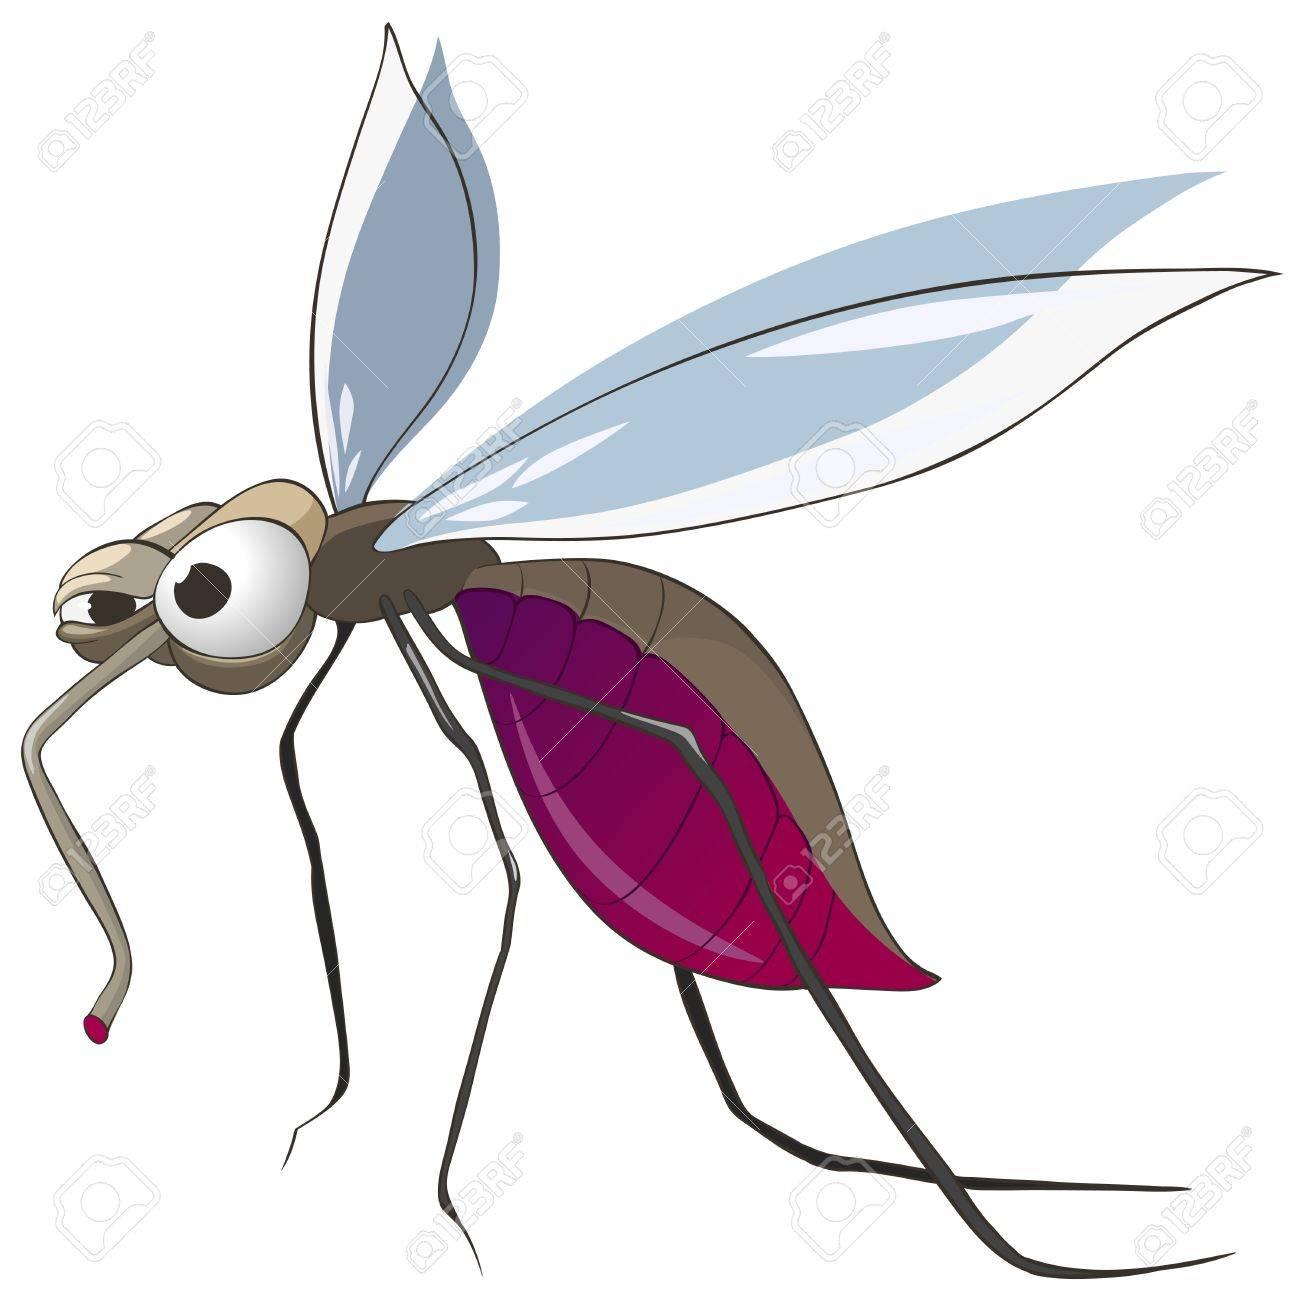 Cartoon Character Mosquito Stock Vector - 10303533